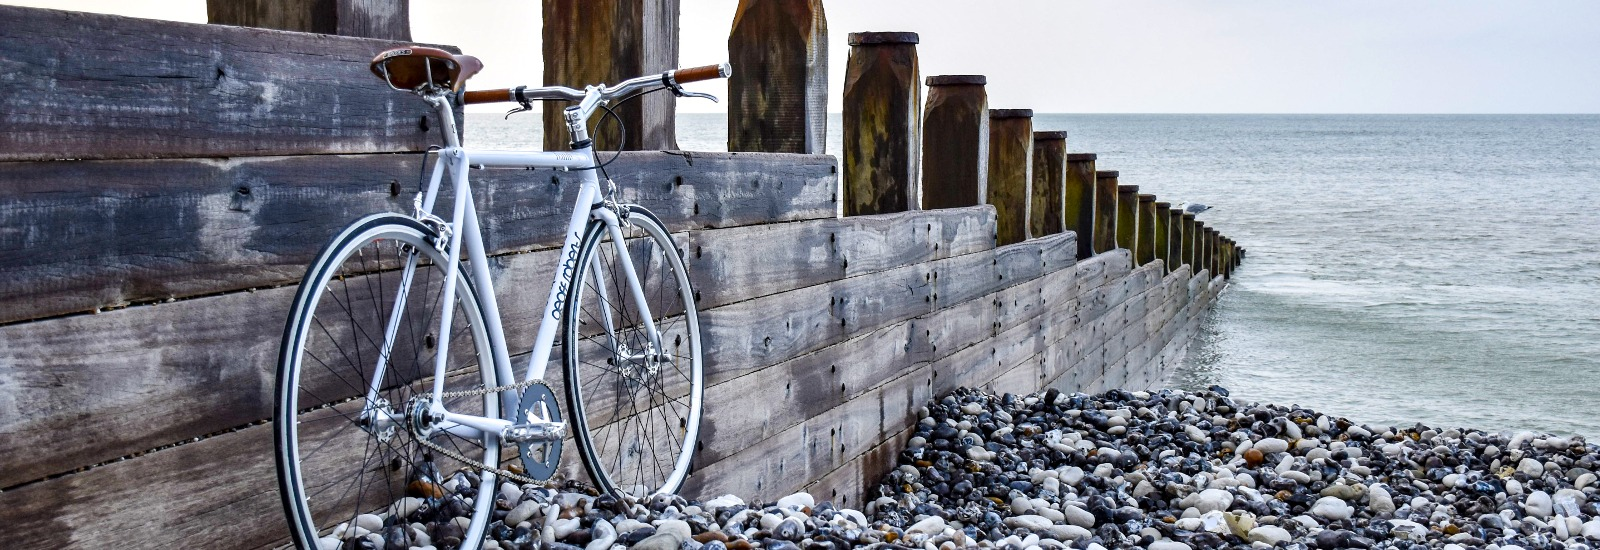 itinerario in bici Maremma Toscana